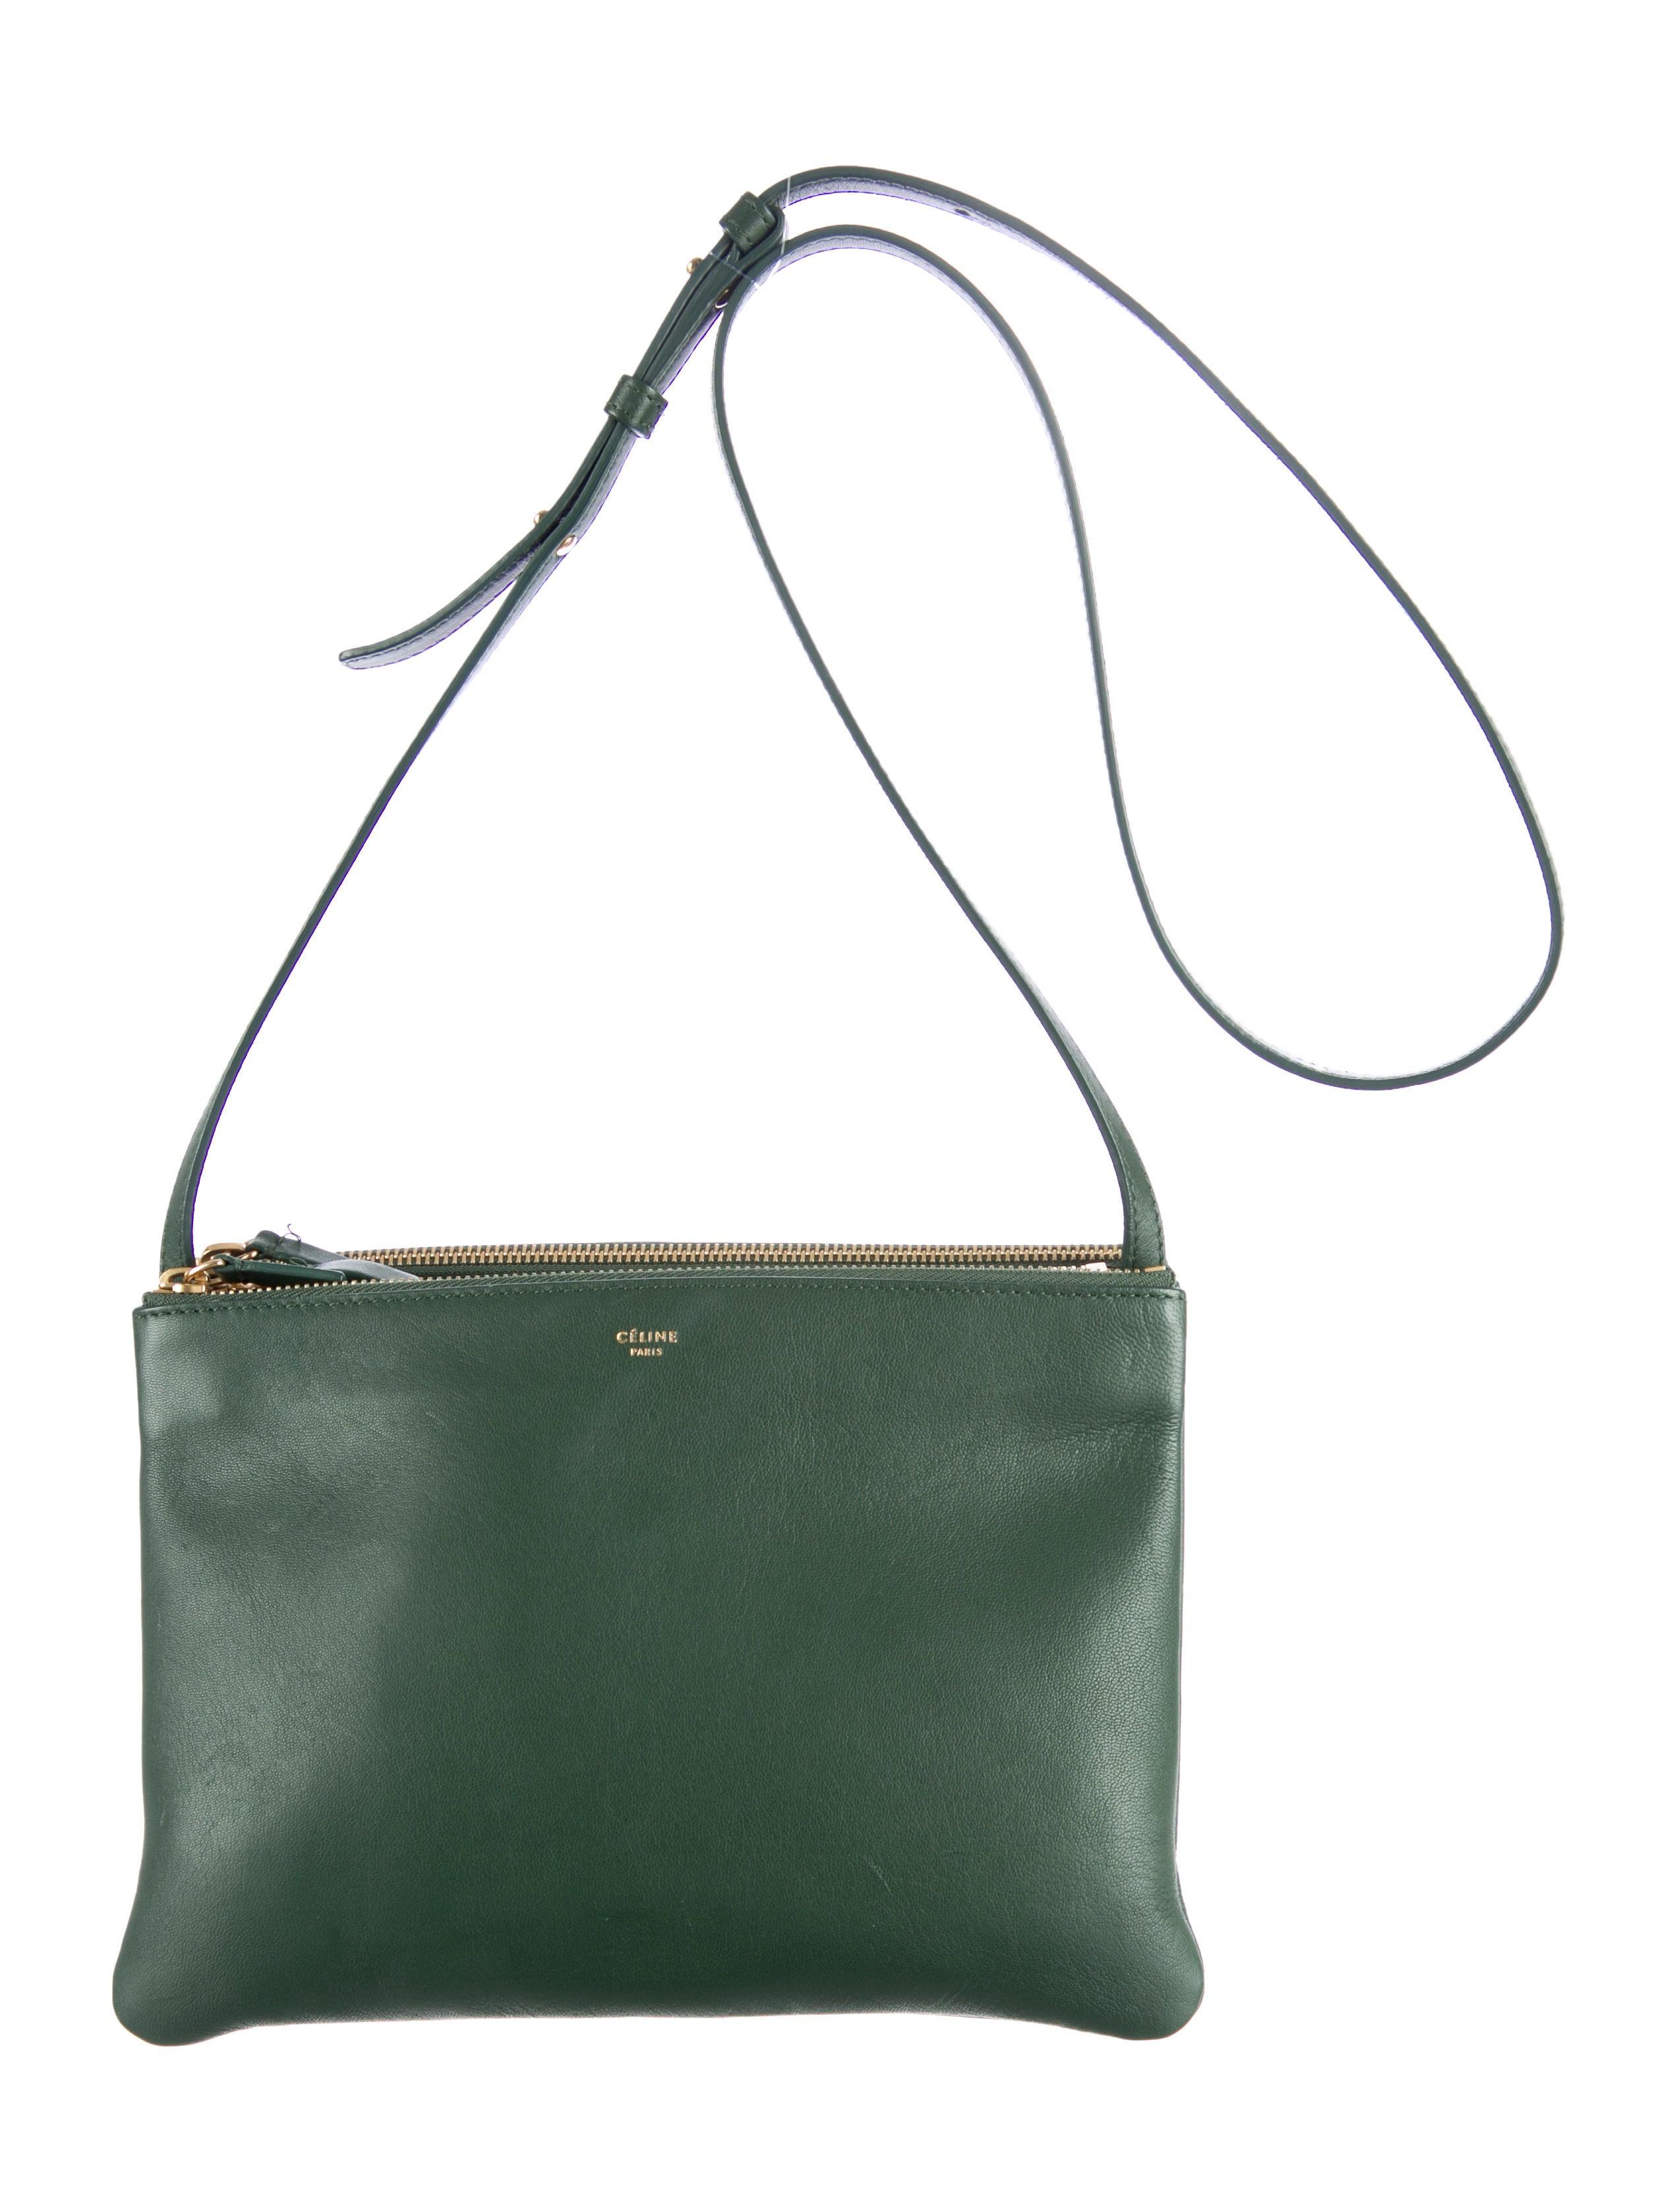 Celine Céline Large Trio Bag - Handbags - CEL28175  b7c3b9c770407